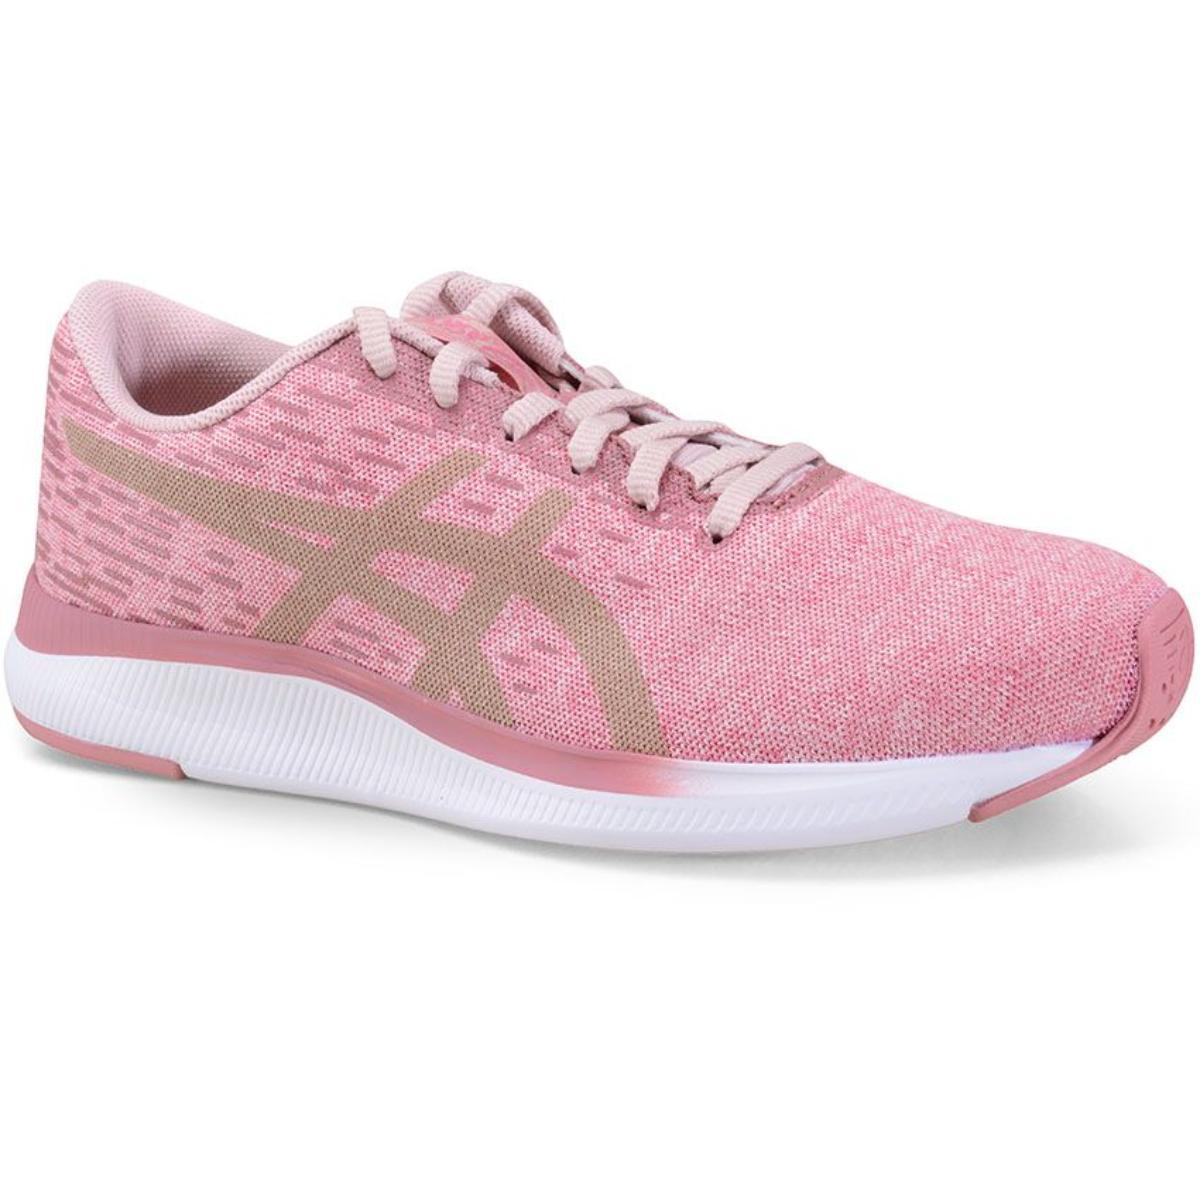 Tênis Feminino Asics 1202a183.700 Streetwise Rosa/branco